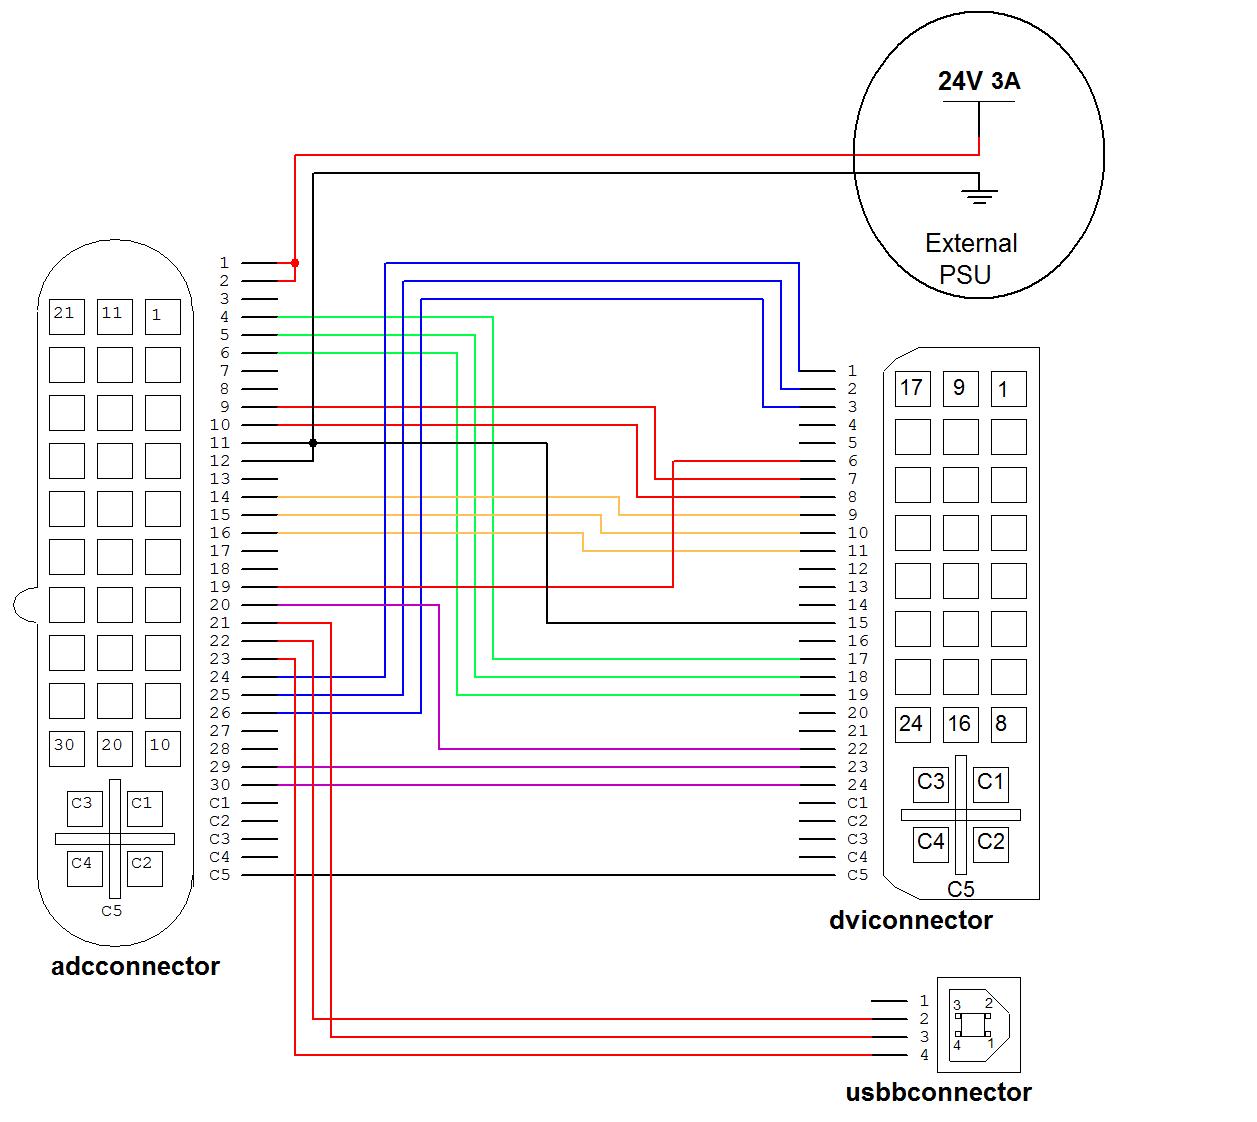 hdmi wiring diagram hdmi to rca cable circuit diagram images hdmi to rh proudq tripa co displayport to dvi wiring diagram dvi to rca wiring diagram